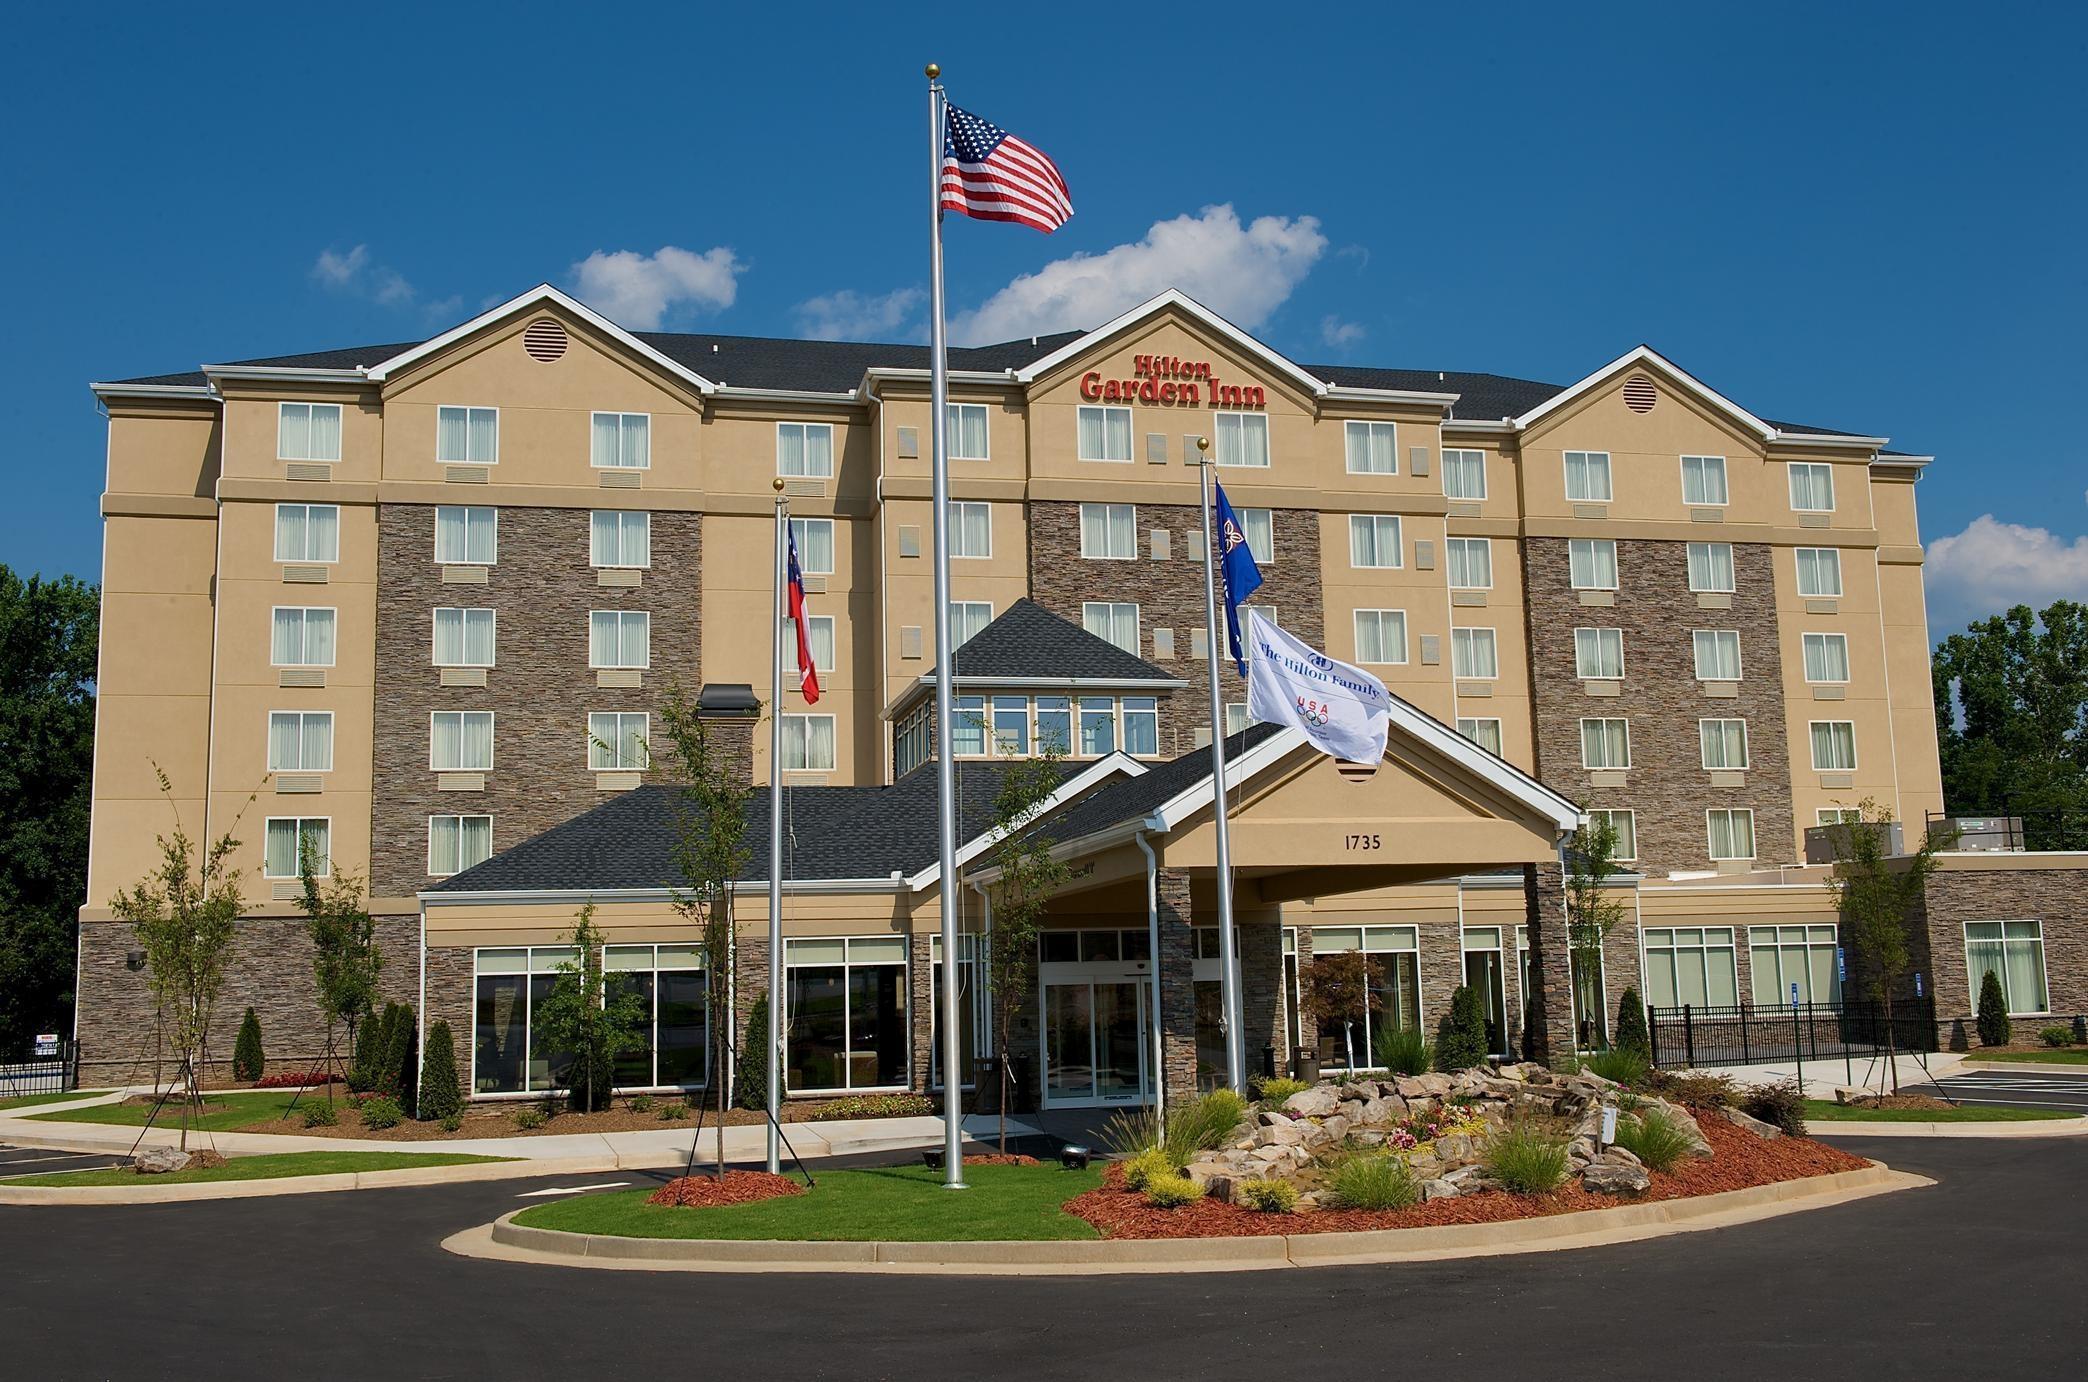 Hilton Garden Inn Gainesville image 0